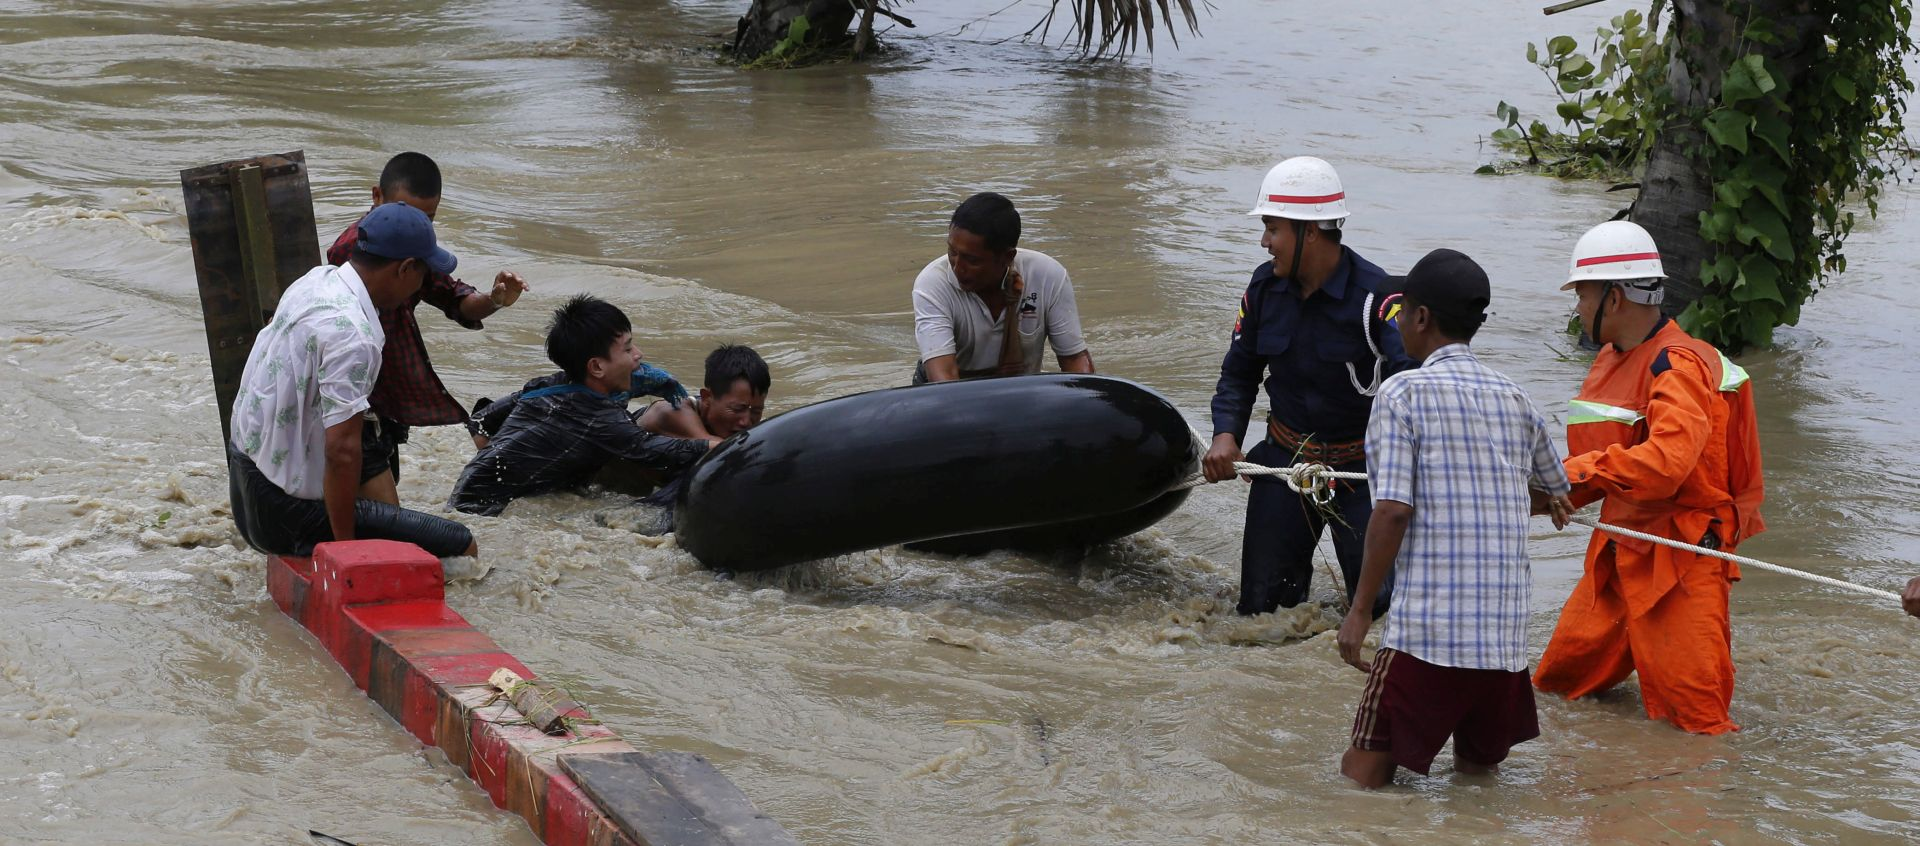 VIDEO: Situacija mirna nakon puknuća brane u Mianmaru